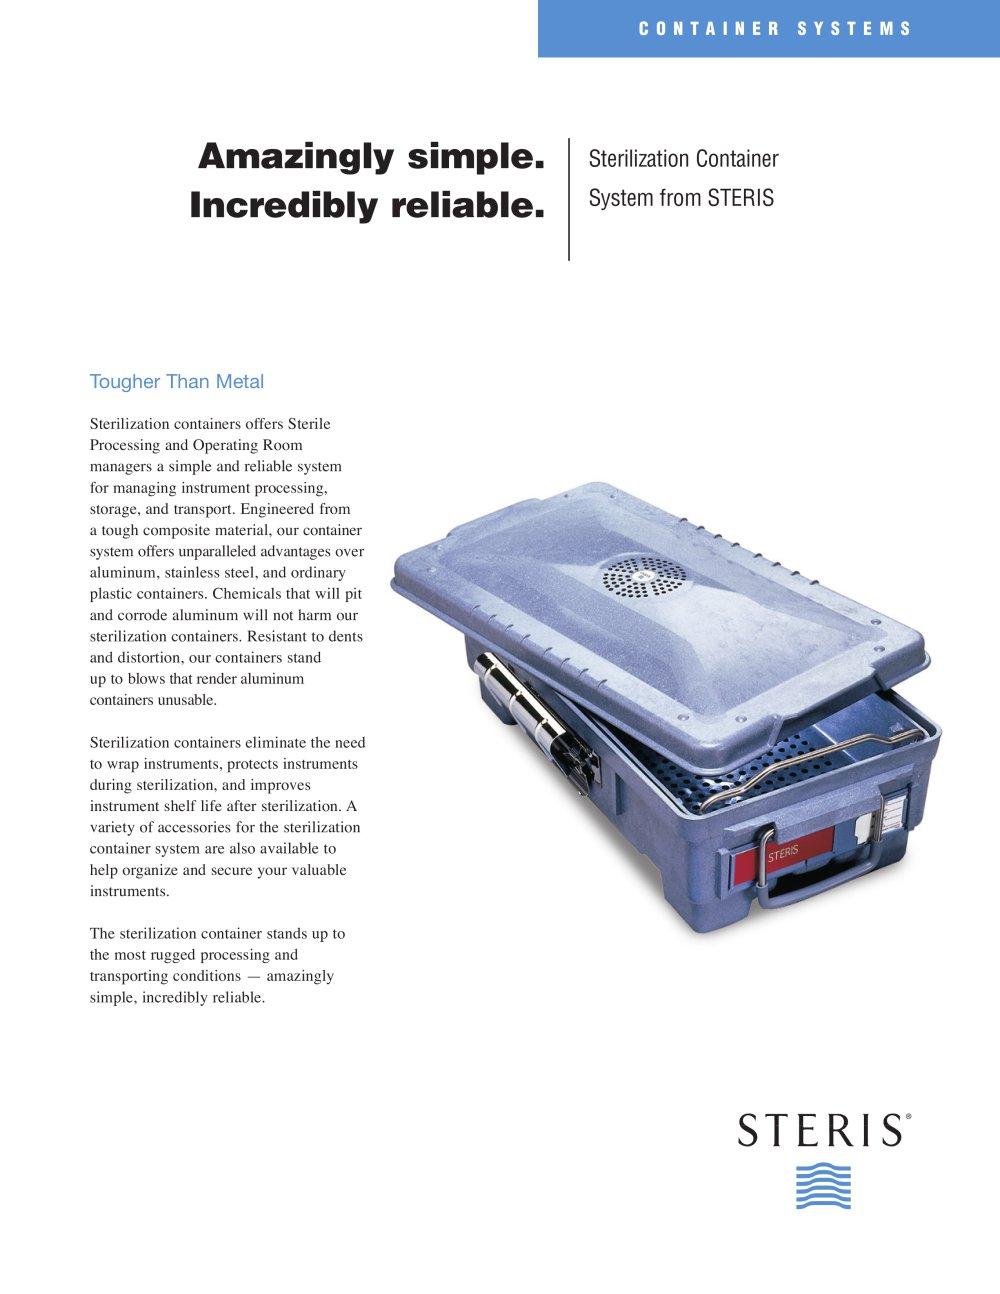 Blue Bands Steam (1 X 334 - Case)